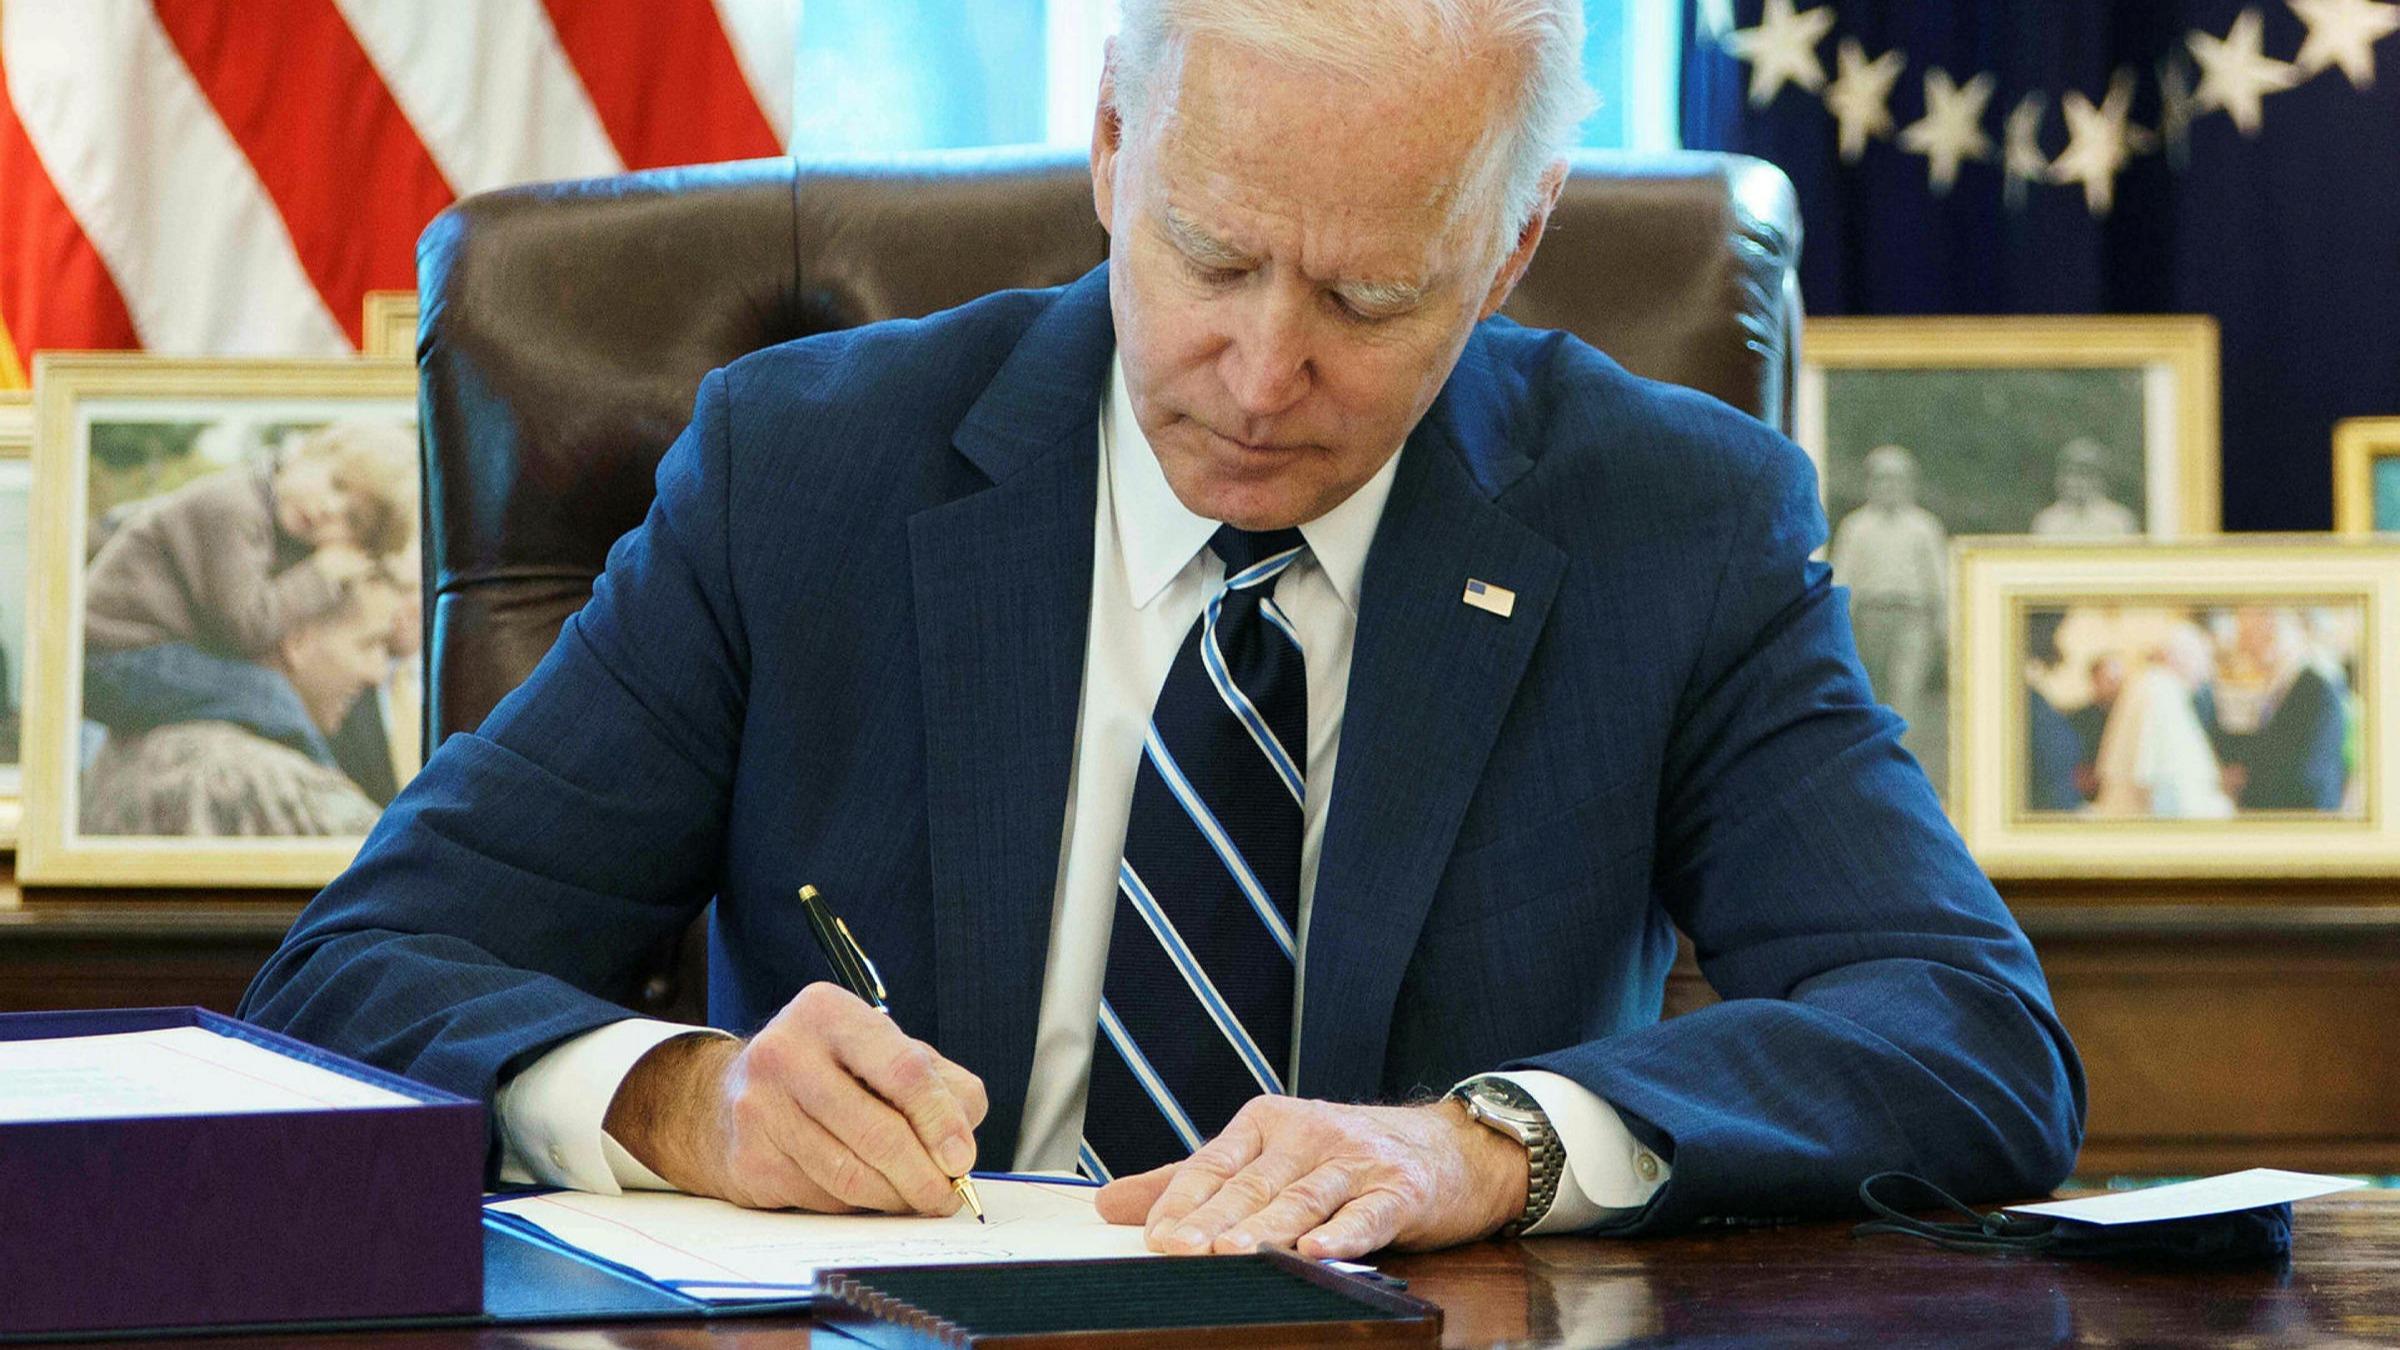 Joe Biden's quietly revolutionary first 100 days | Financial Times